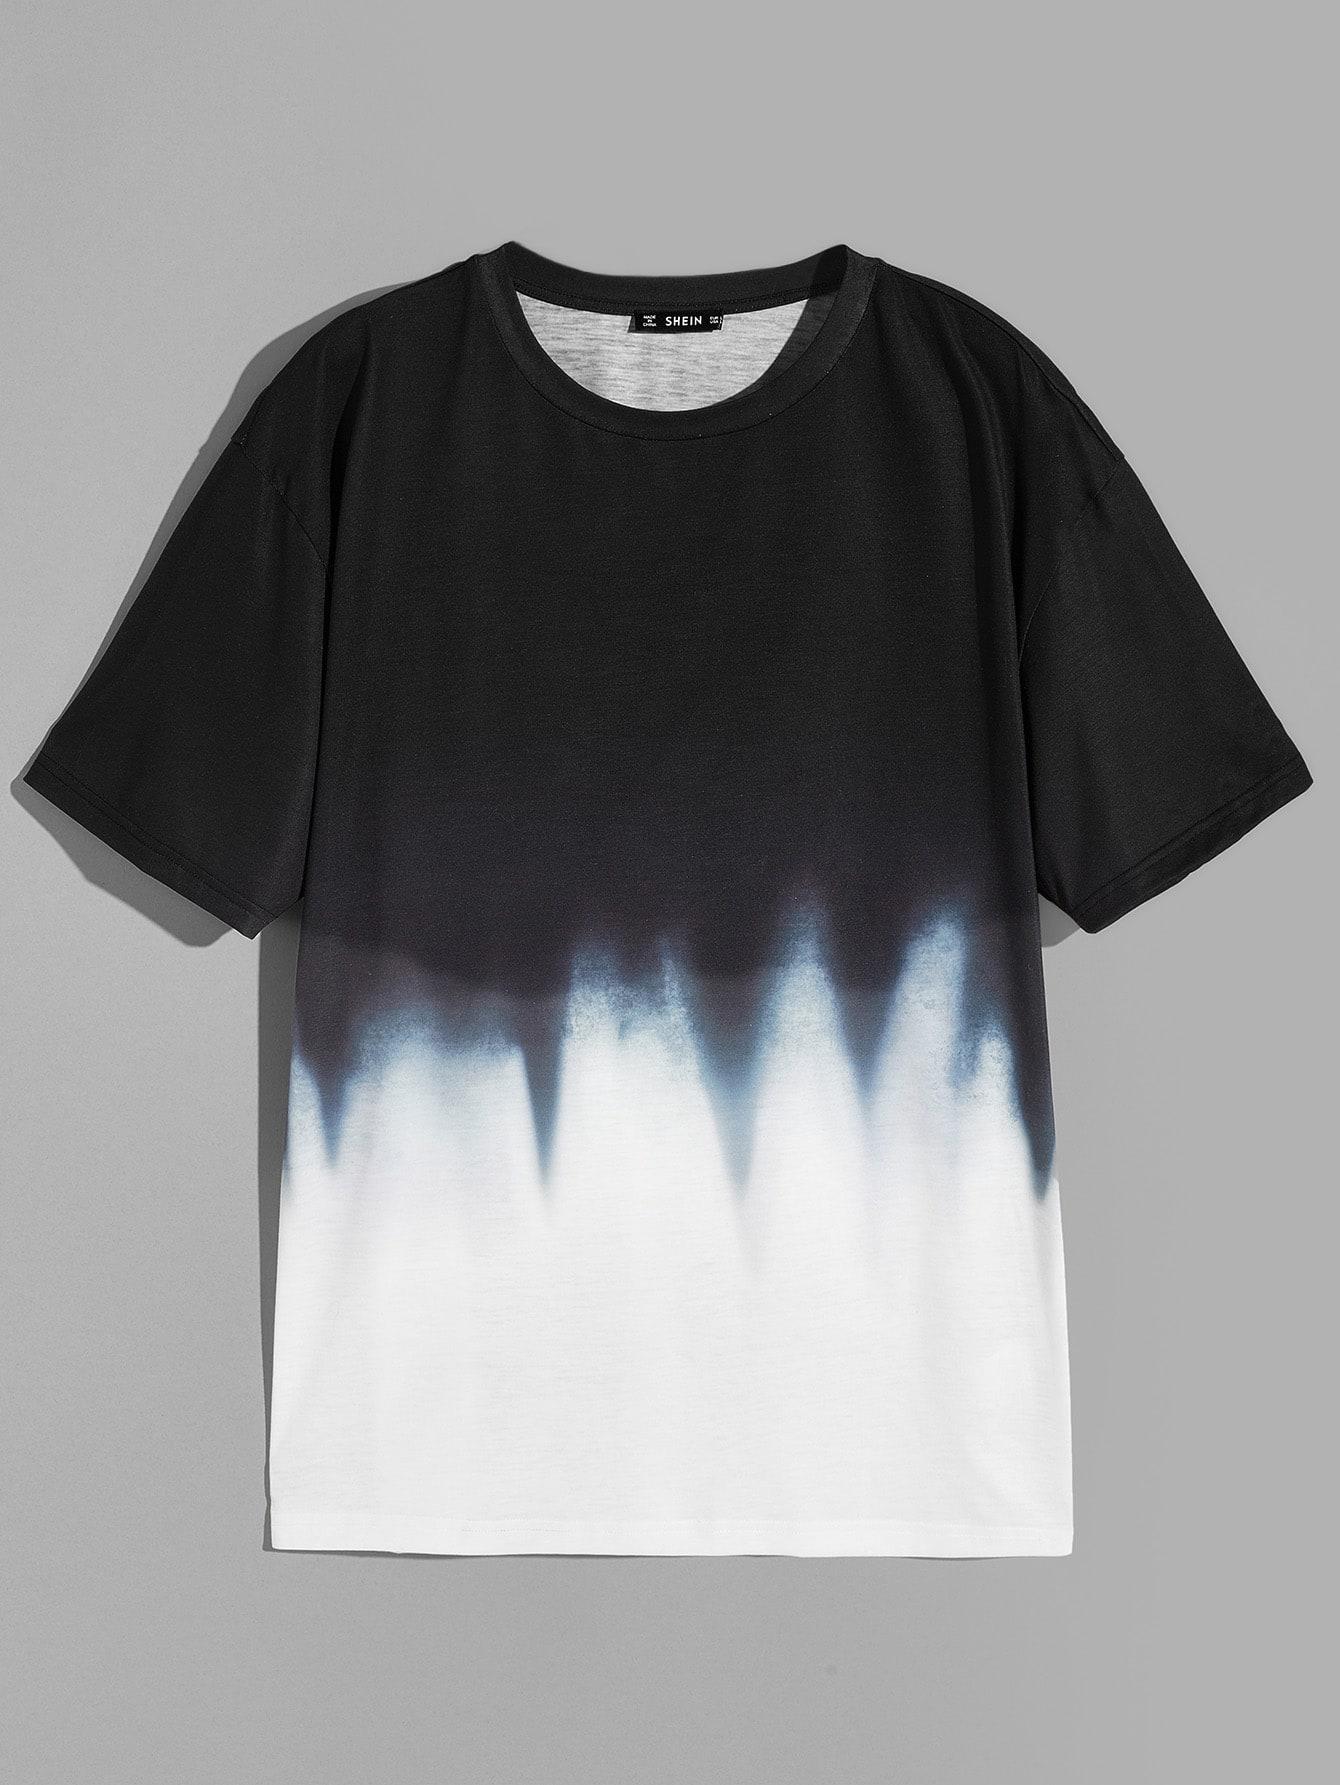 Купить Мужская футболка с коротким рукавом, null, SheIn